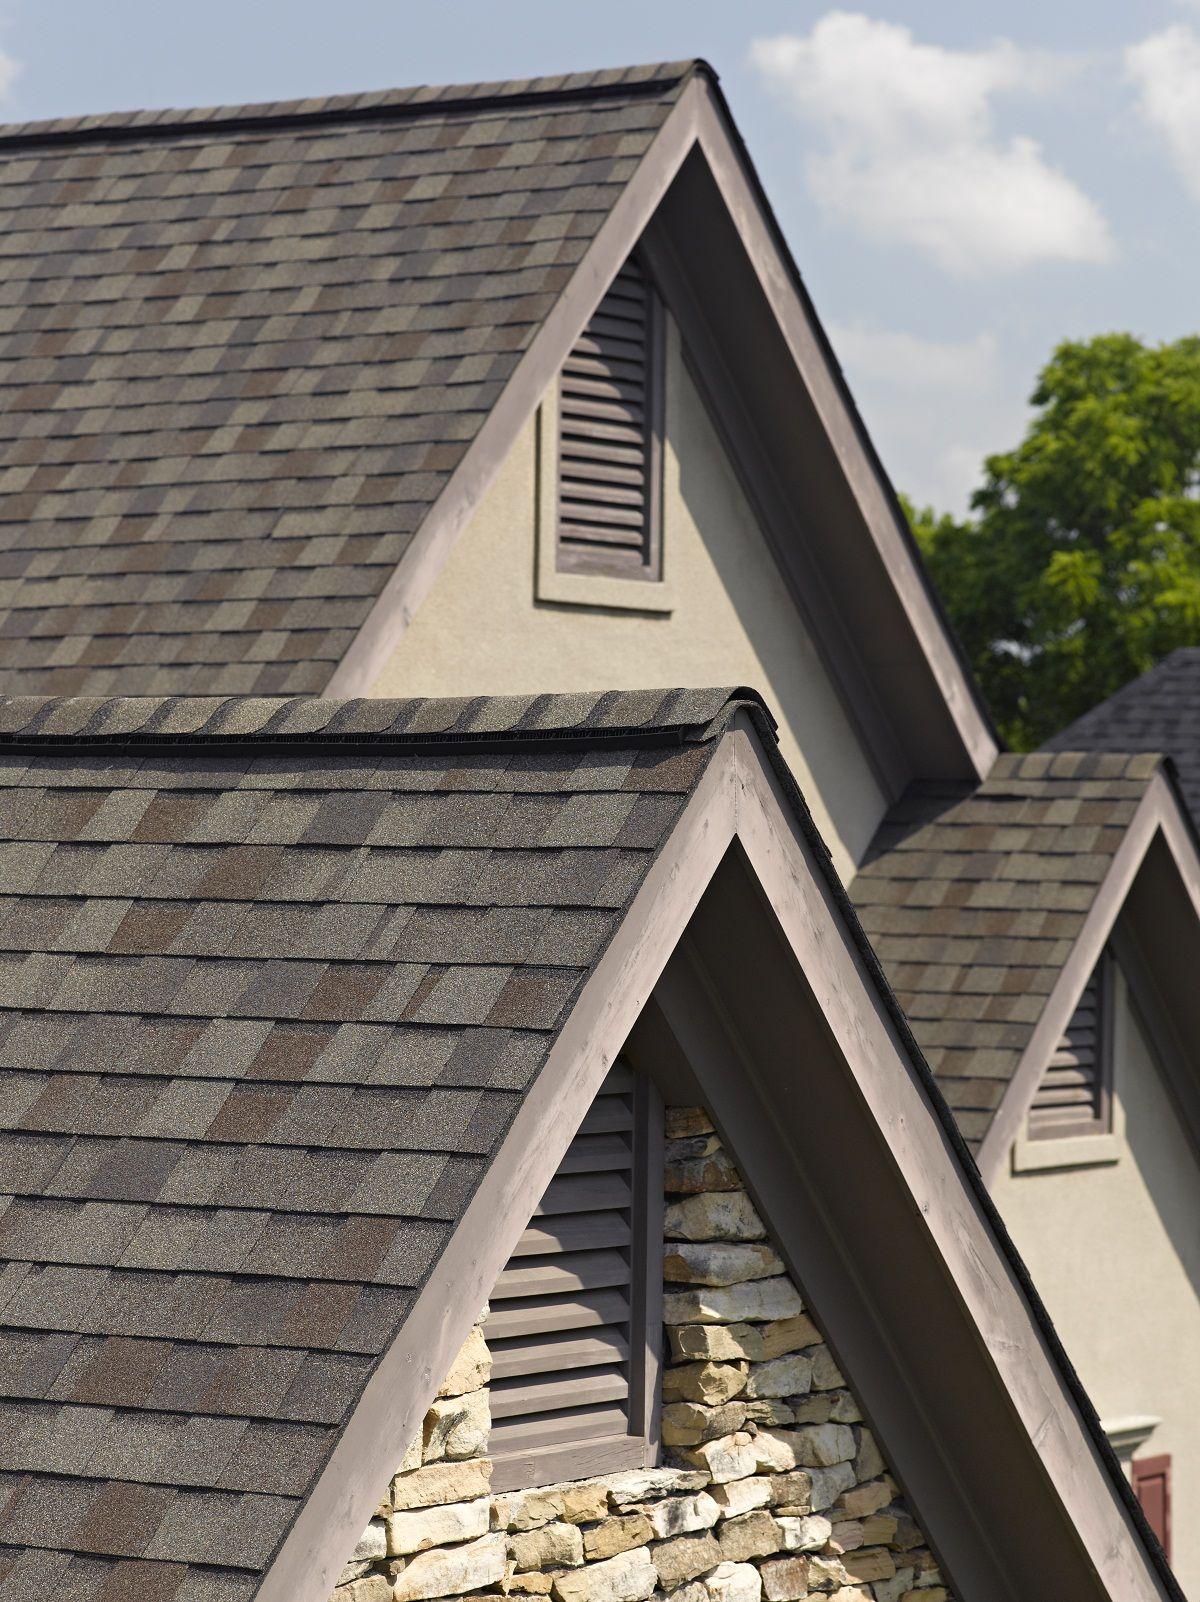 Certainteed Landmark Shingle In Weathered Wood Roof Shingle